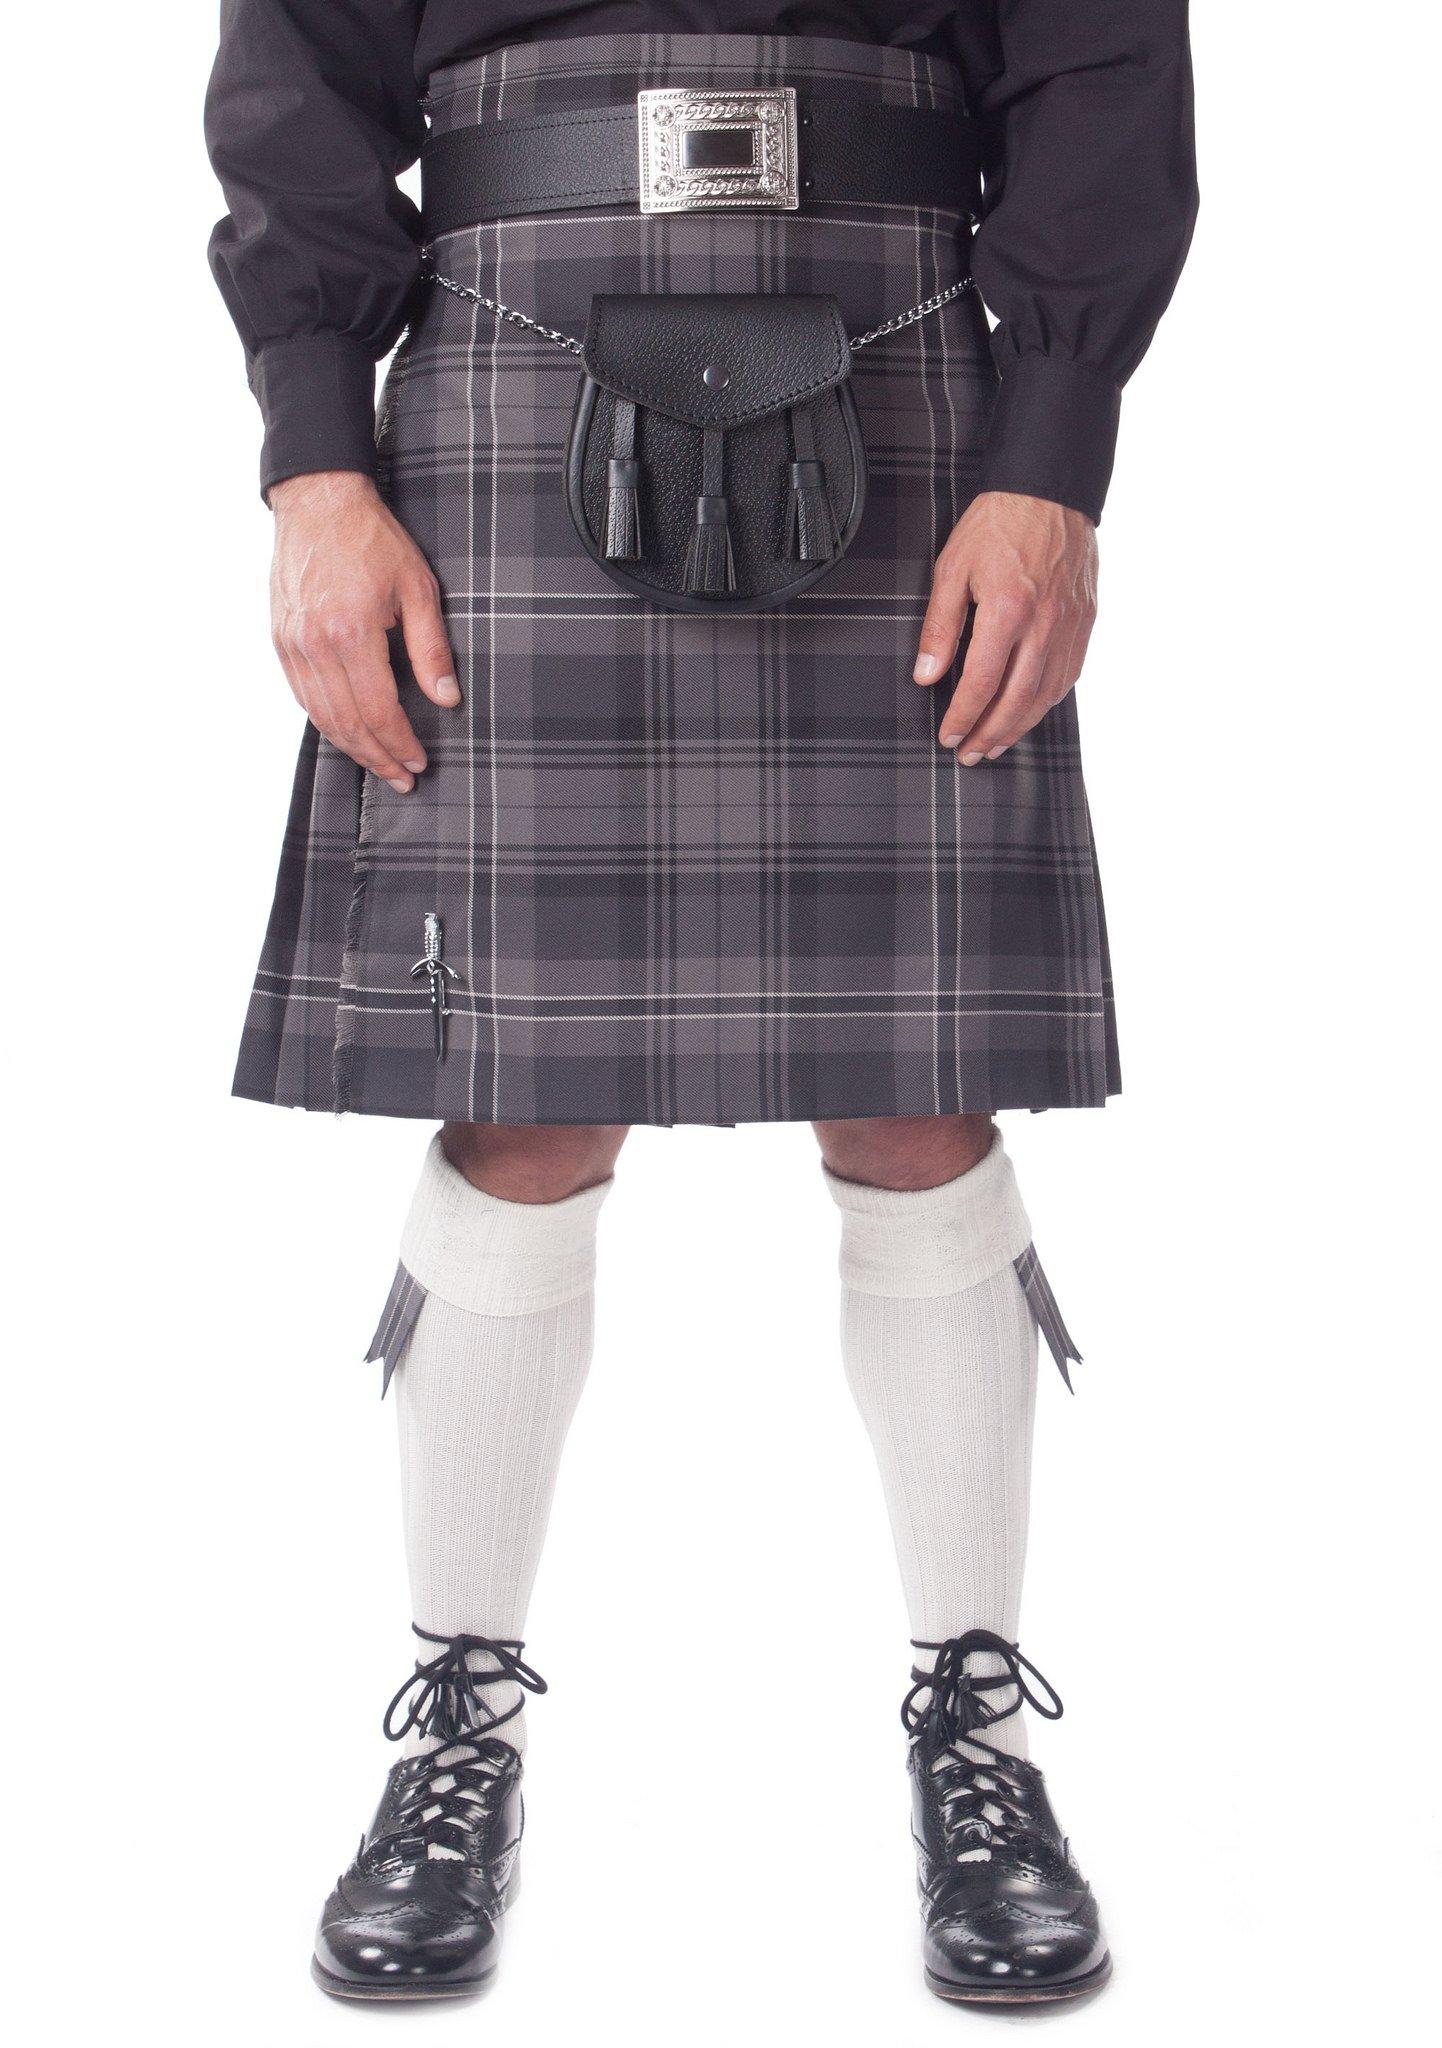 Kilt Society Mens 7 Piece Casual Kilt Outfit- Hamilton Tartan with White Hose 46'' to 50''